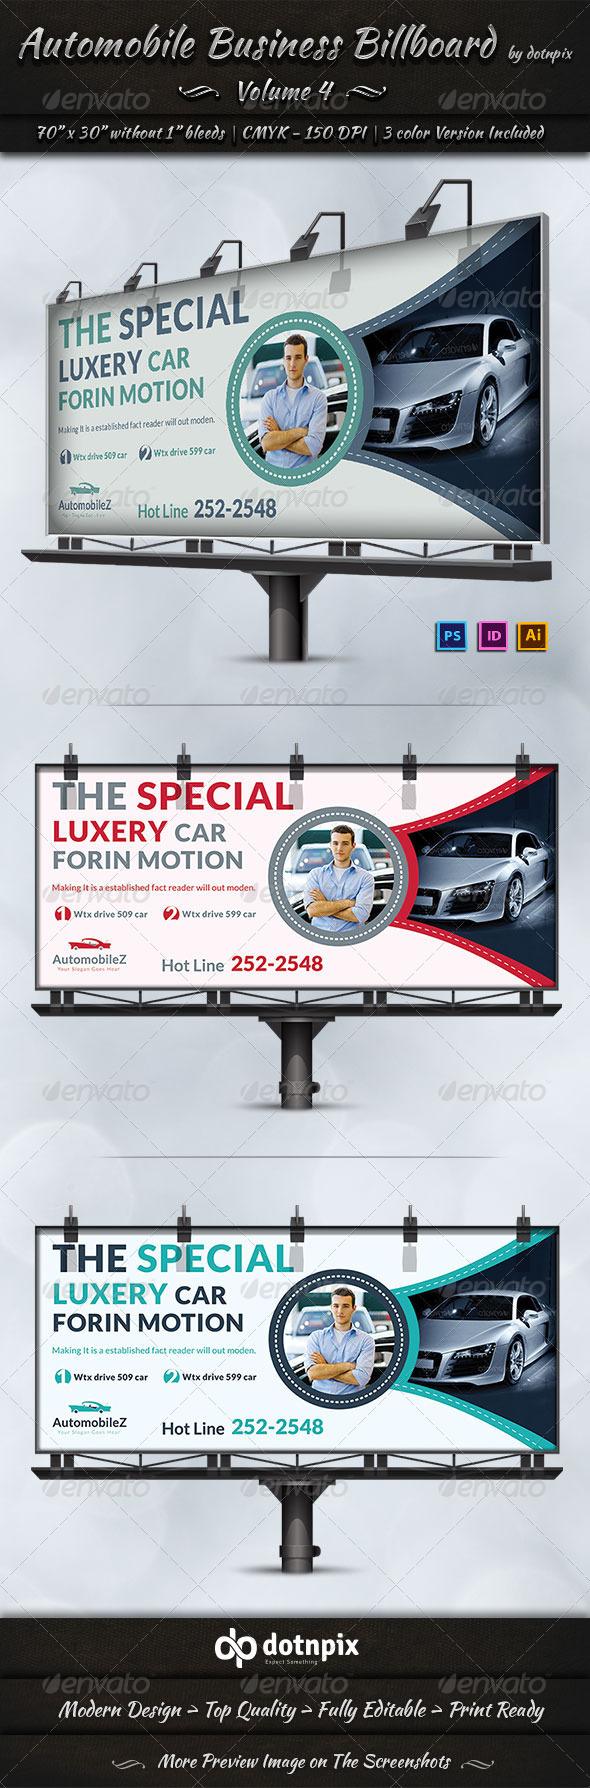 GraphicRiver Automobile Business Billboard Volume 4 6933979